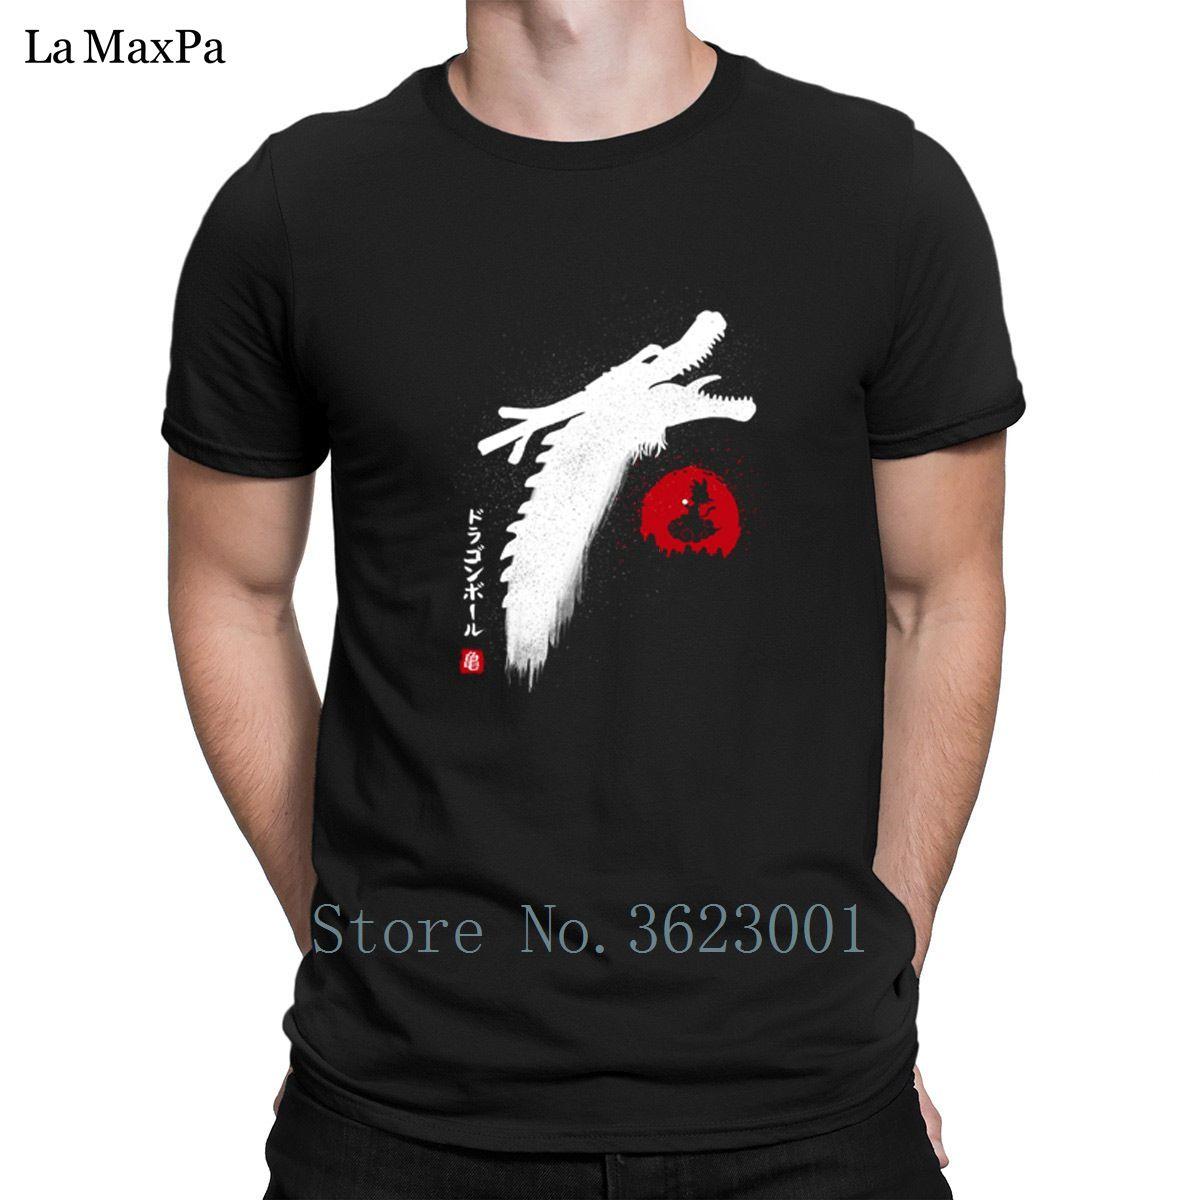 b4509e2c834 3xl Graphic T Shirts Cheap – Rockwall Auction